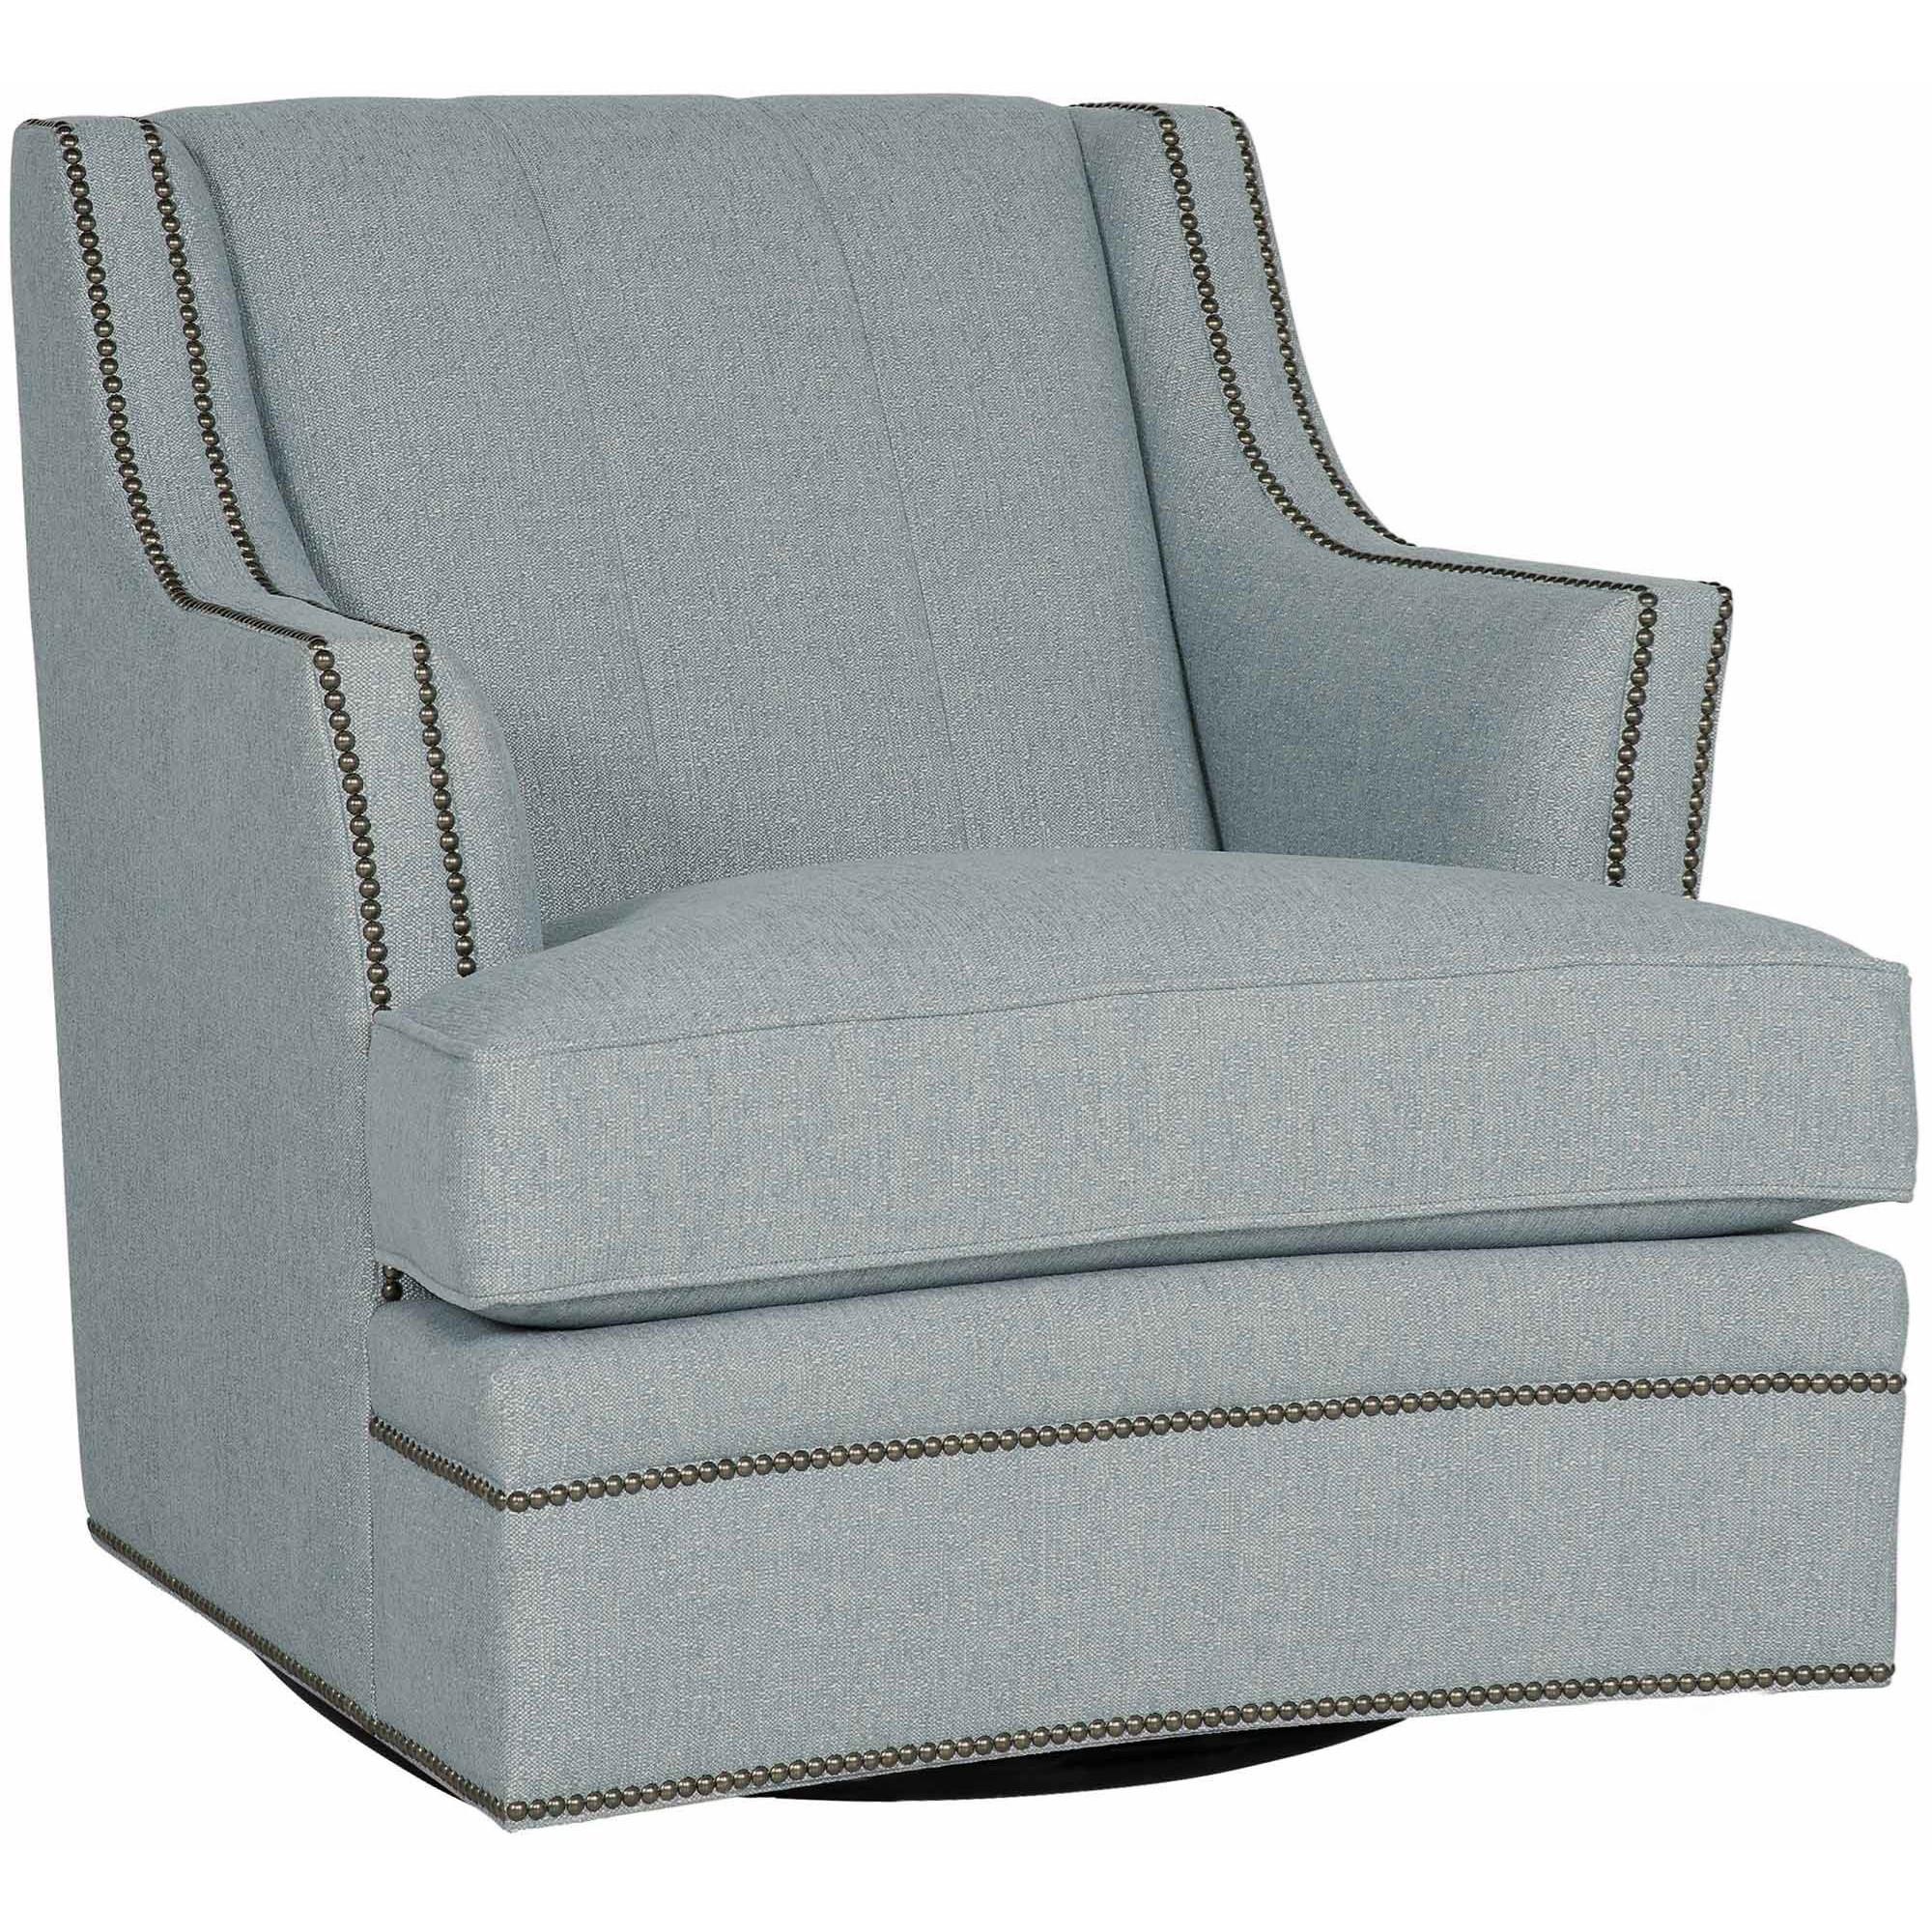 Prime Bernhardt Fairchild Transitional Channeled Back Swivel Chair Uwap Interior Chair Design Uwaporg